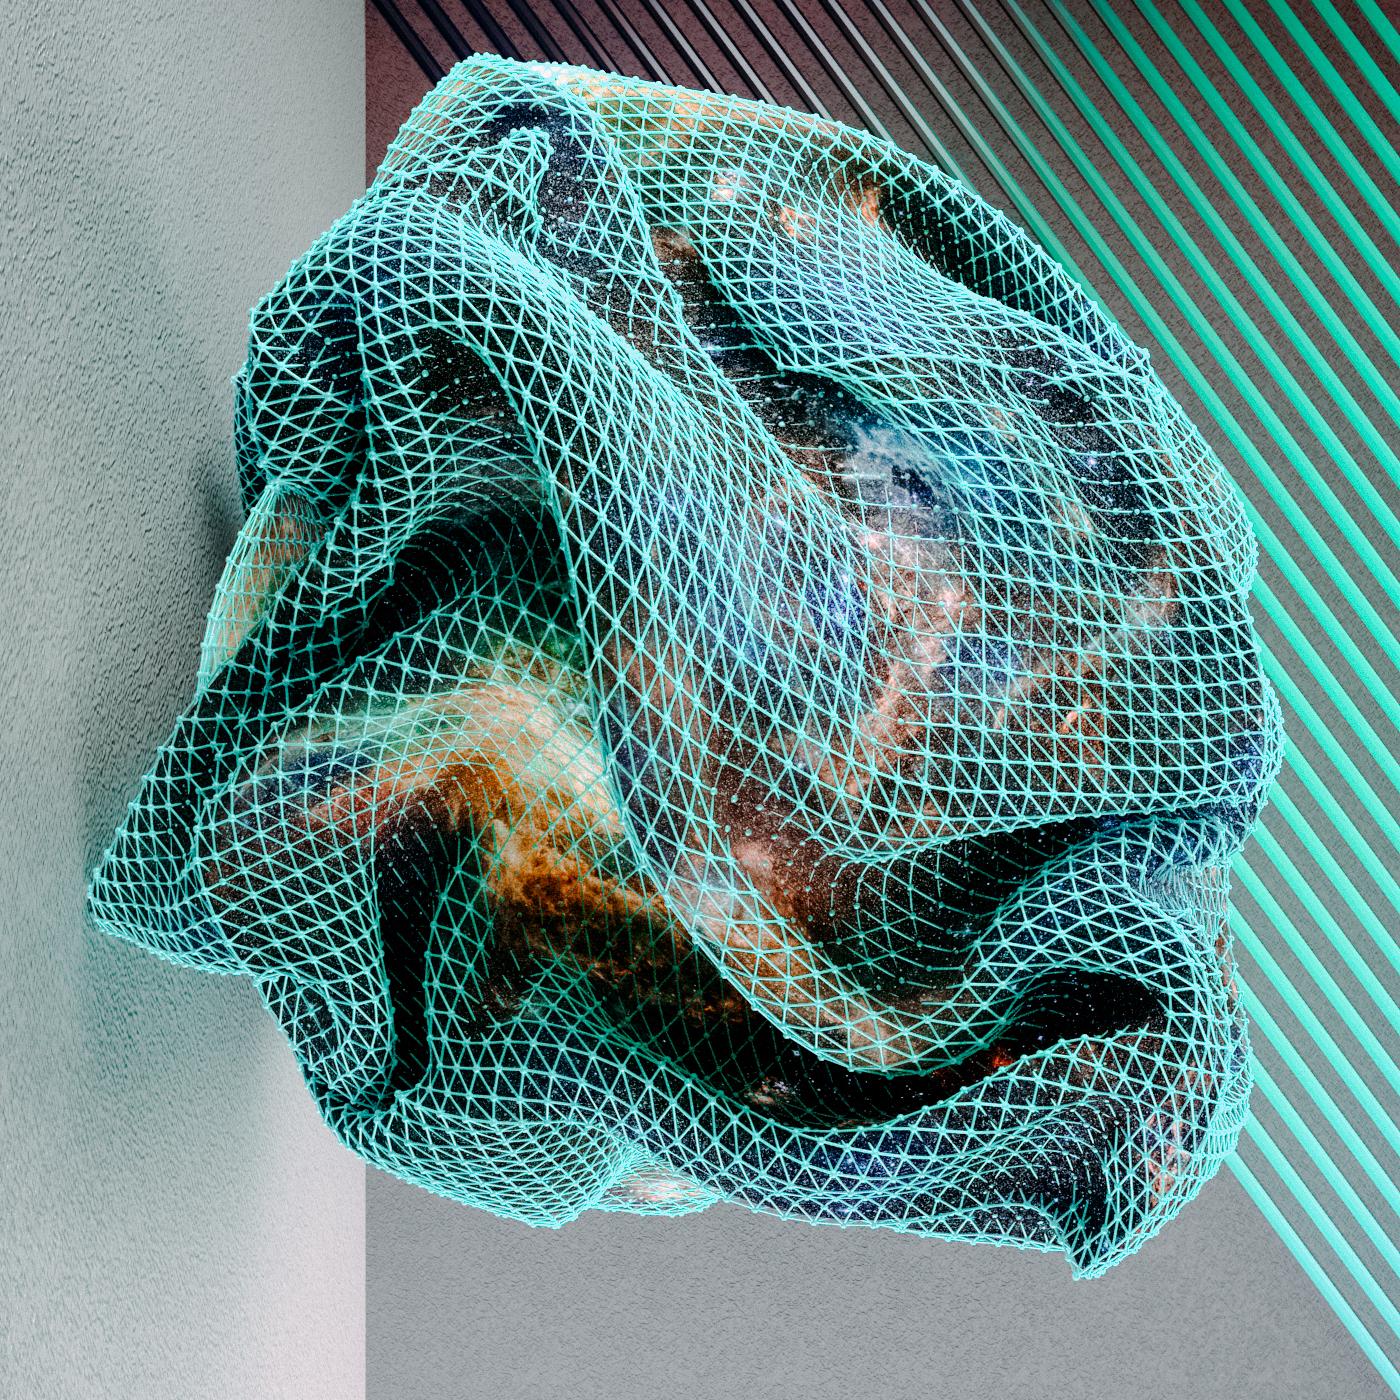 Leonardoworx 3D design